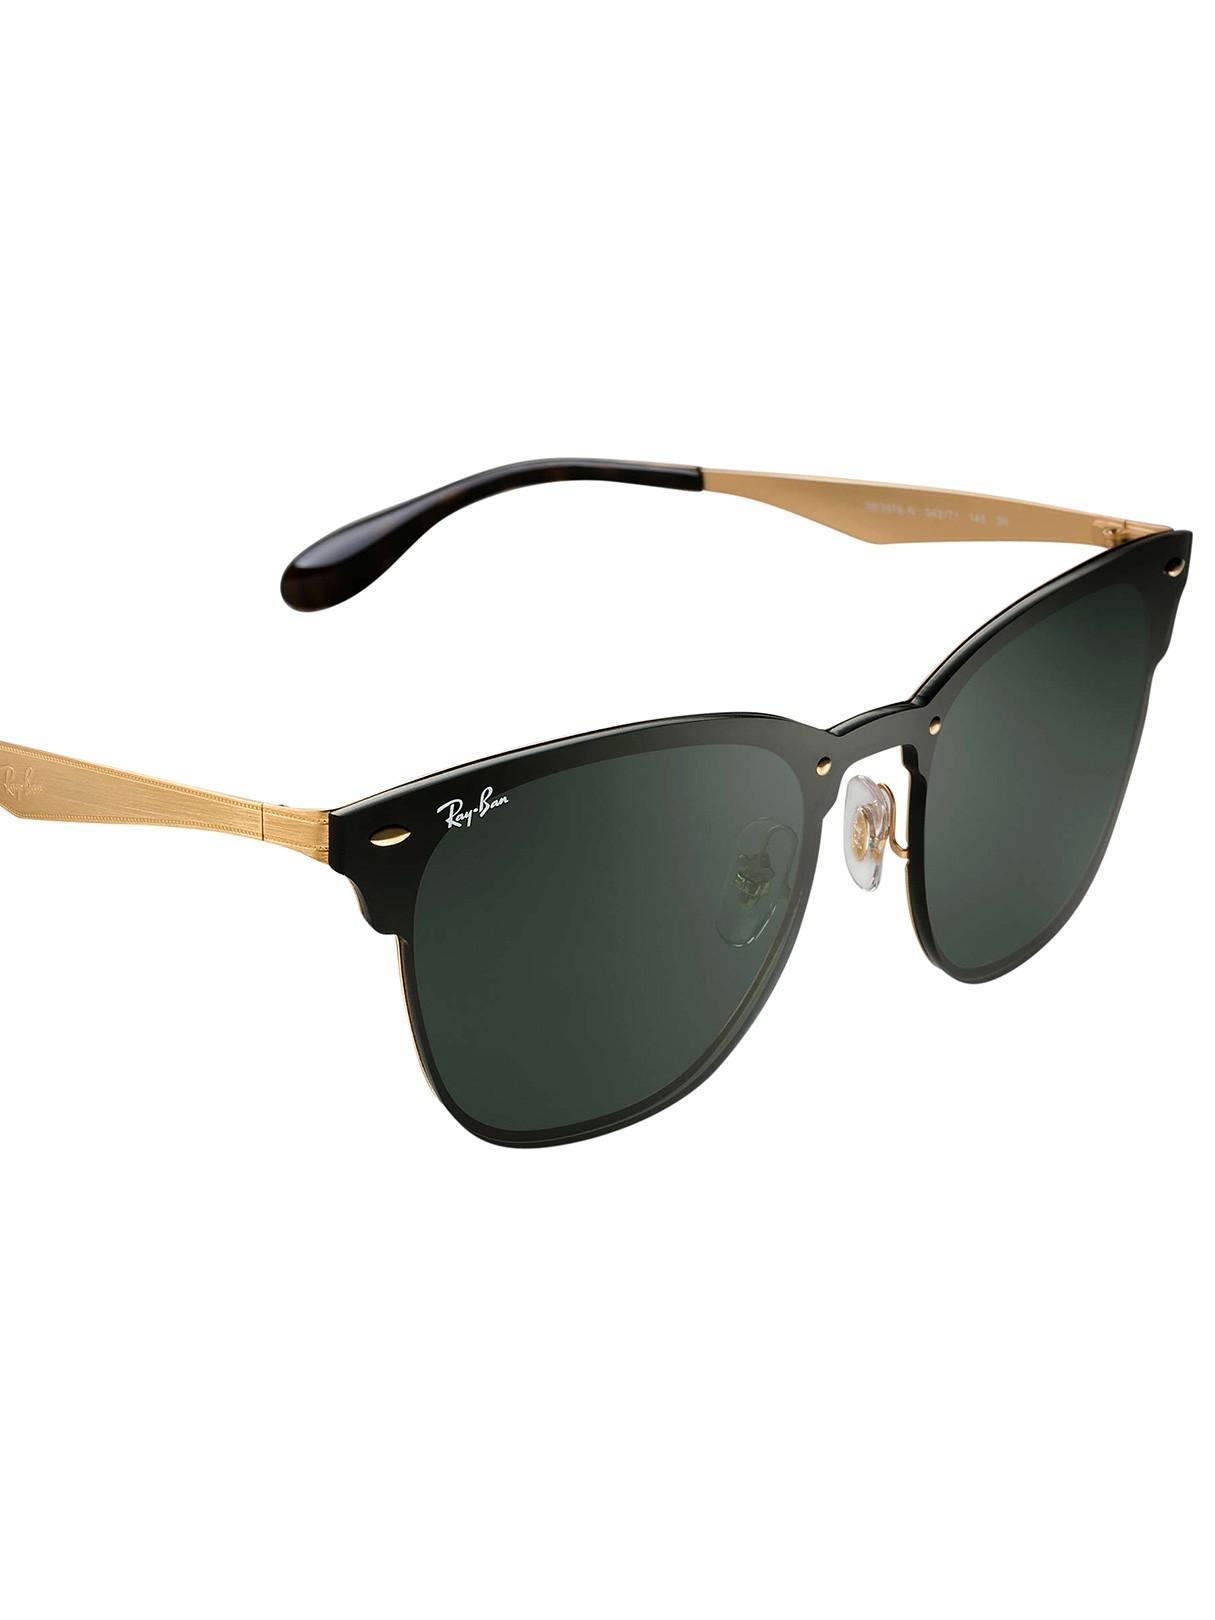 6f3e5ccb38 Ray-Ban Black Gold Blaze Clubmaster Steel Sunglasses